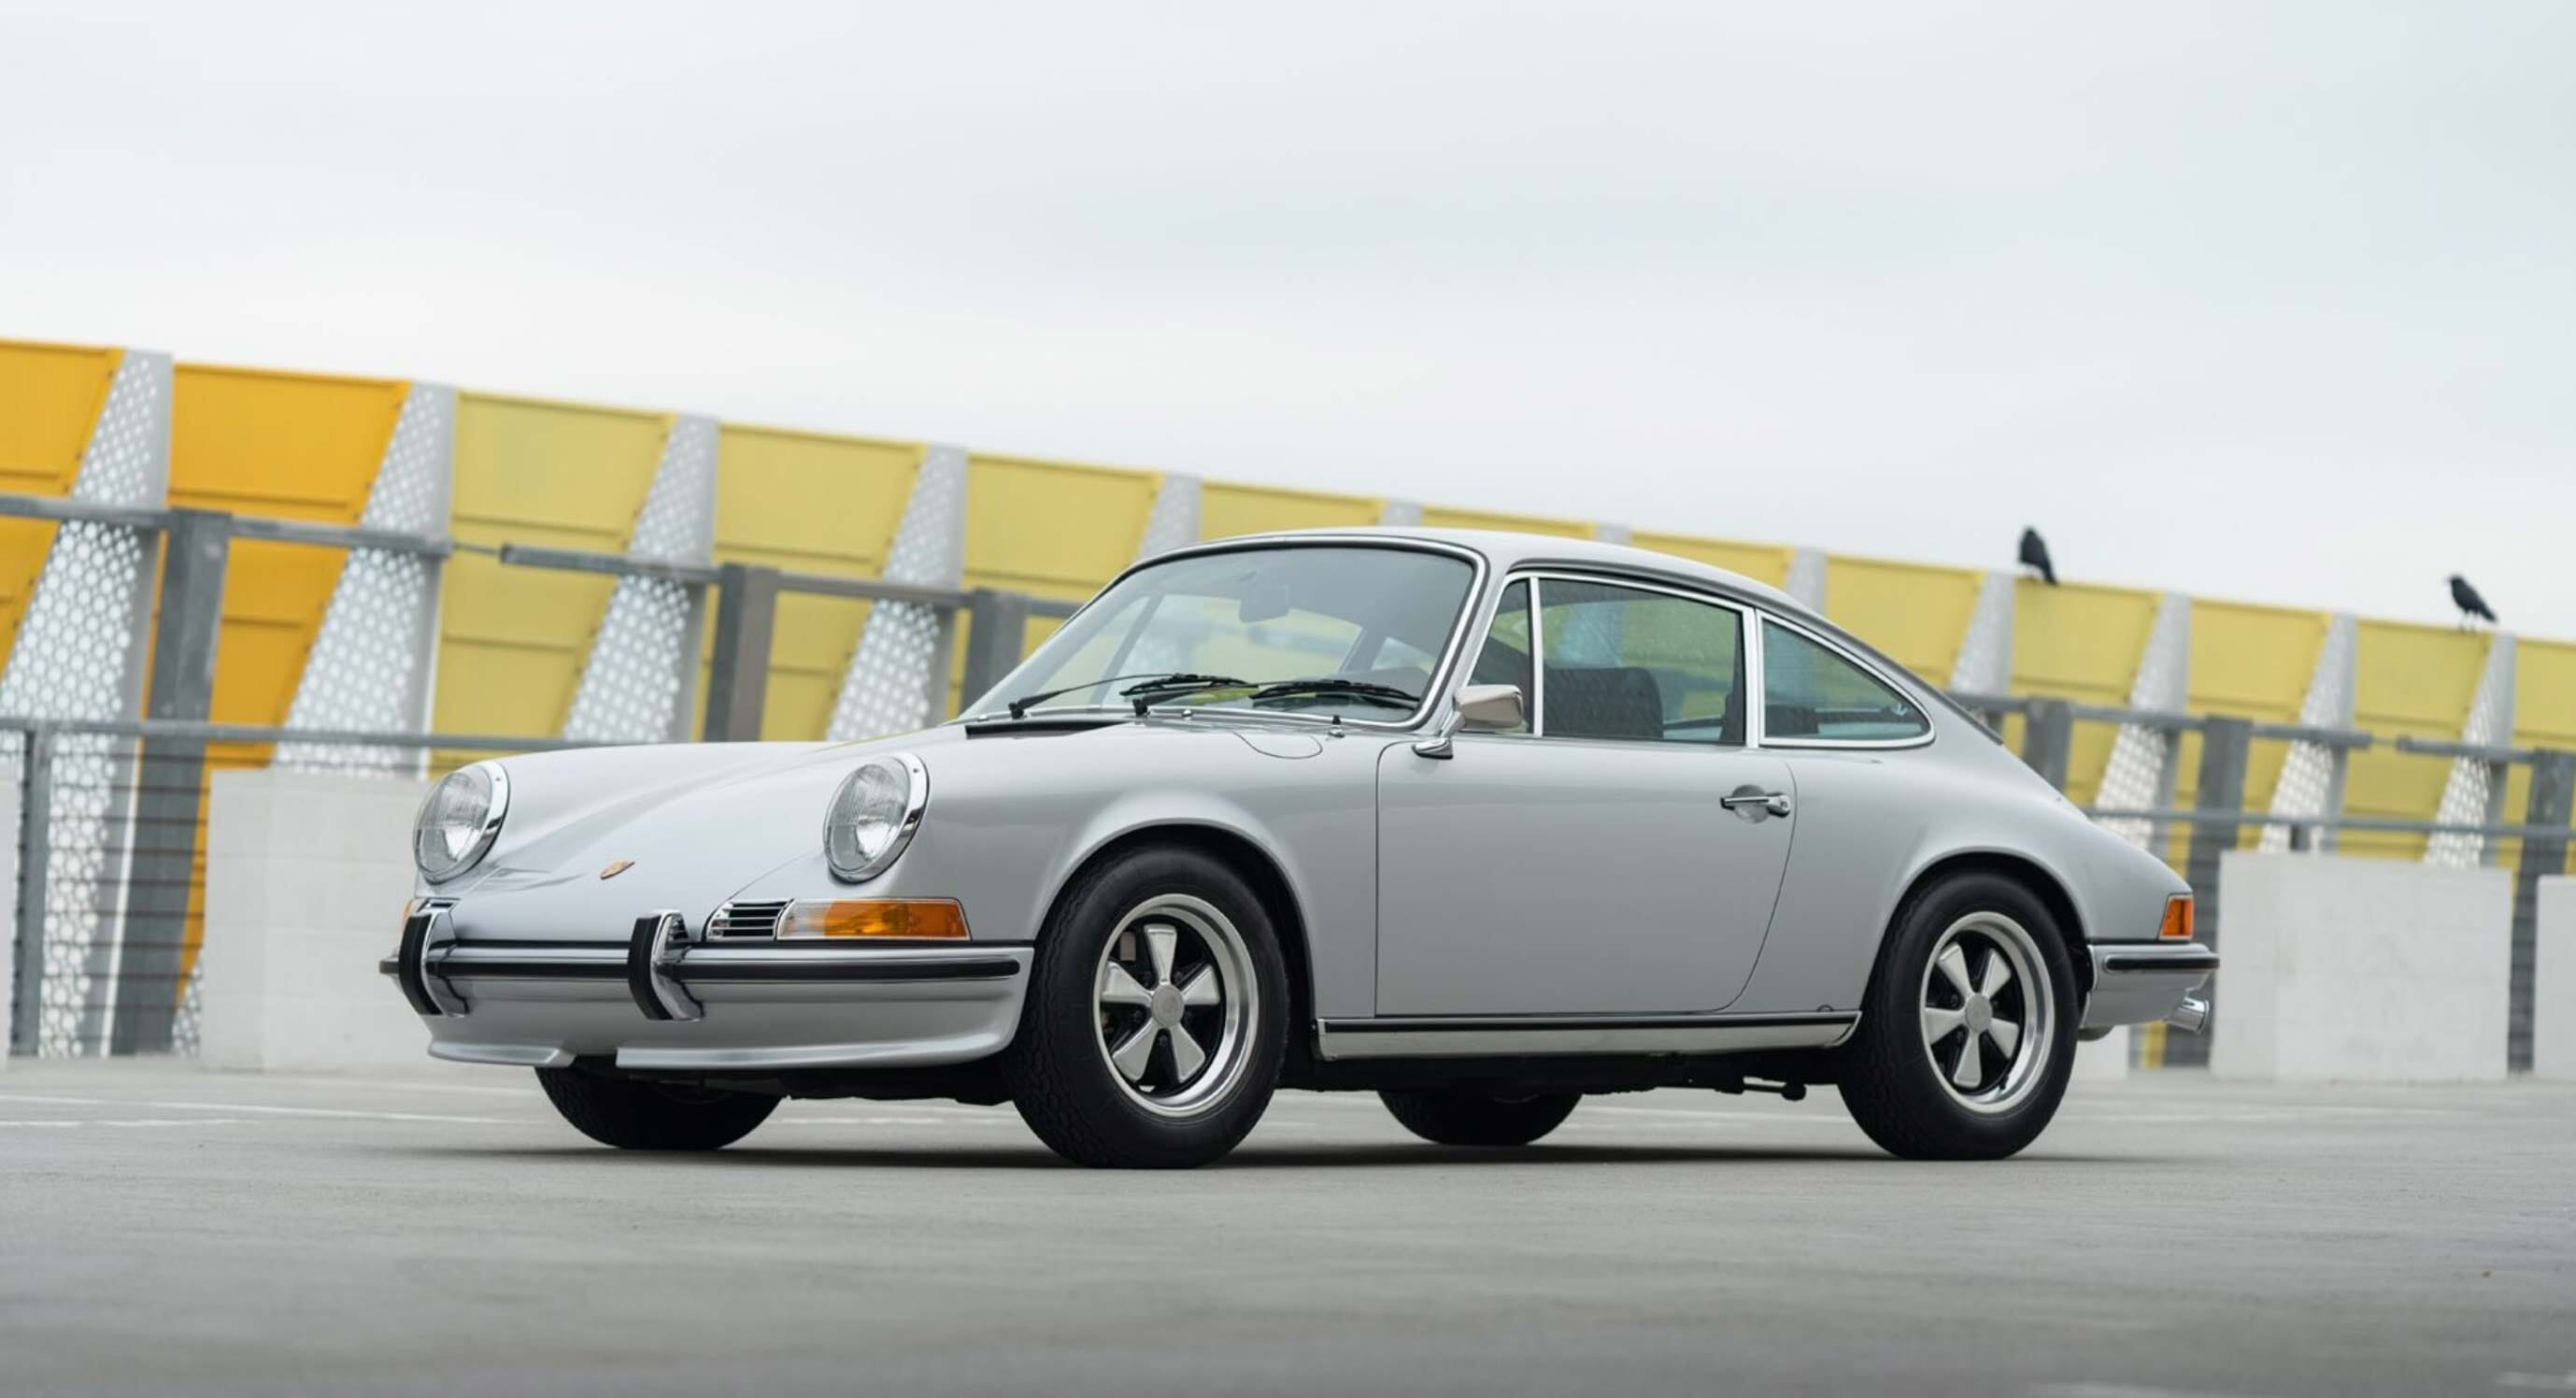 Classic Car Find Of The Week: 1972 Porsche 911 2.4 S